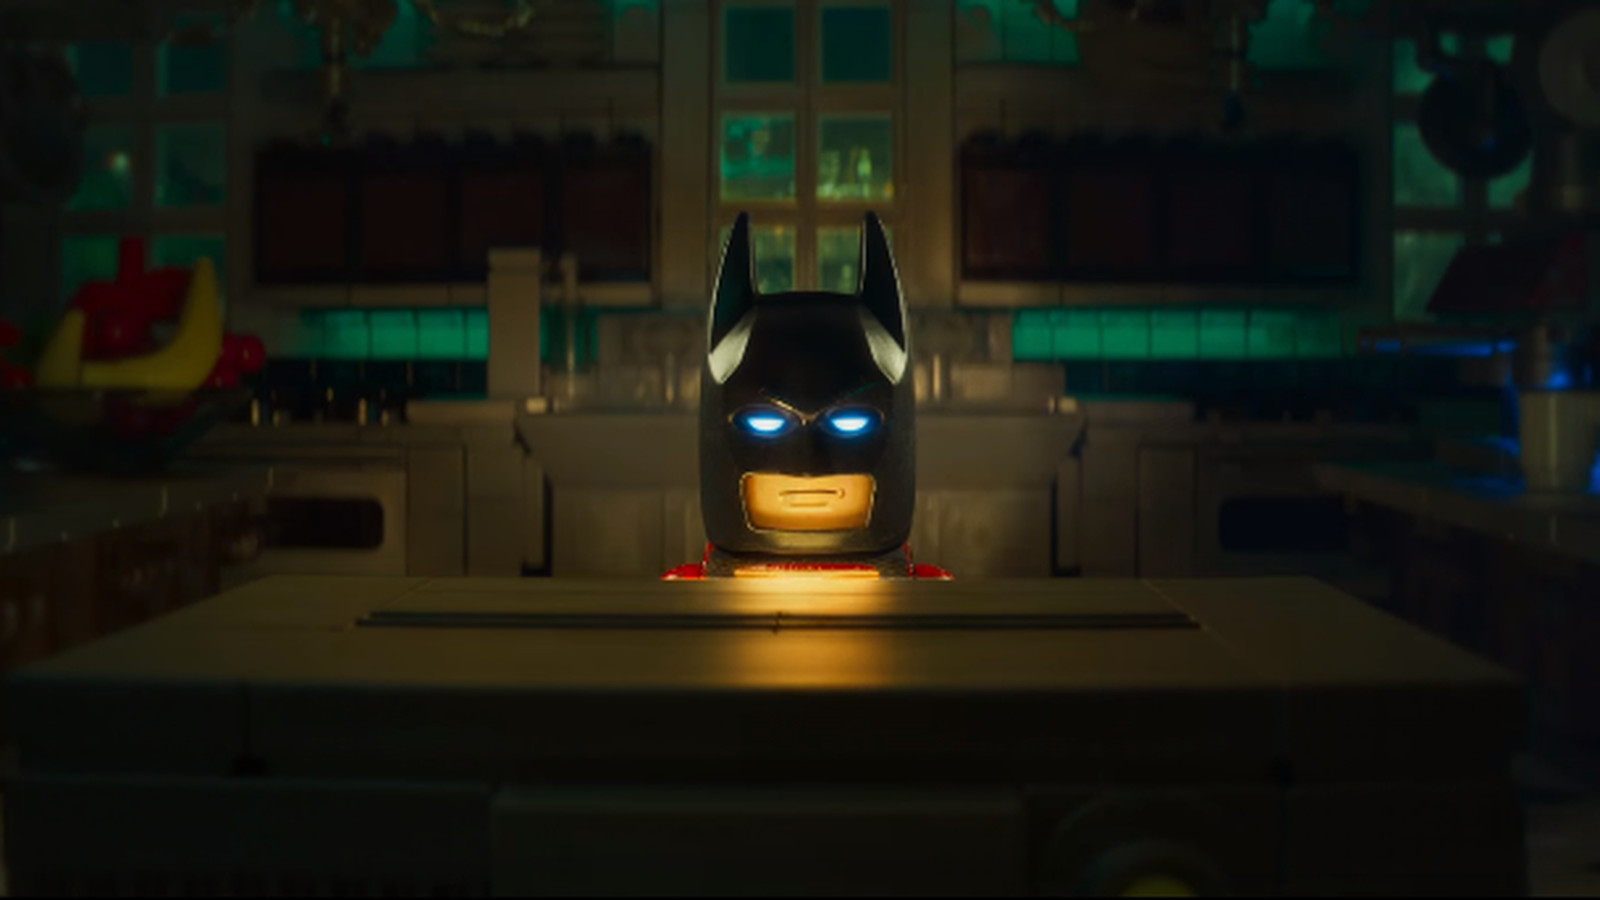 Lego Batman Movie trailer stars a lobster-eating, rapping Will Arnett - Polygon